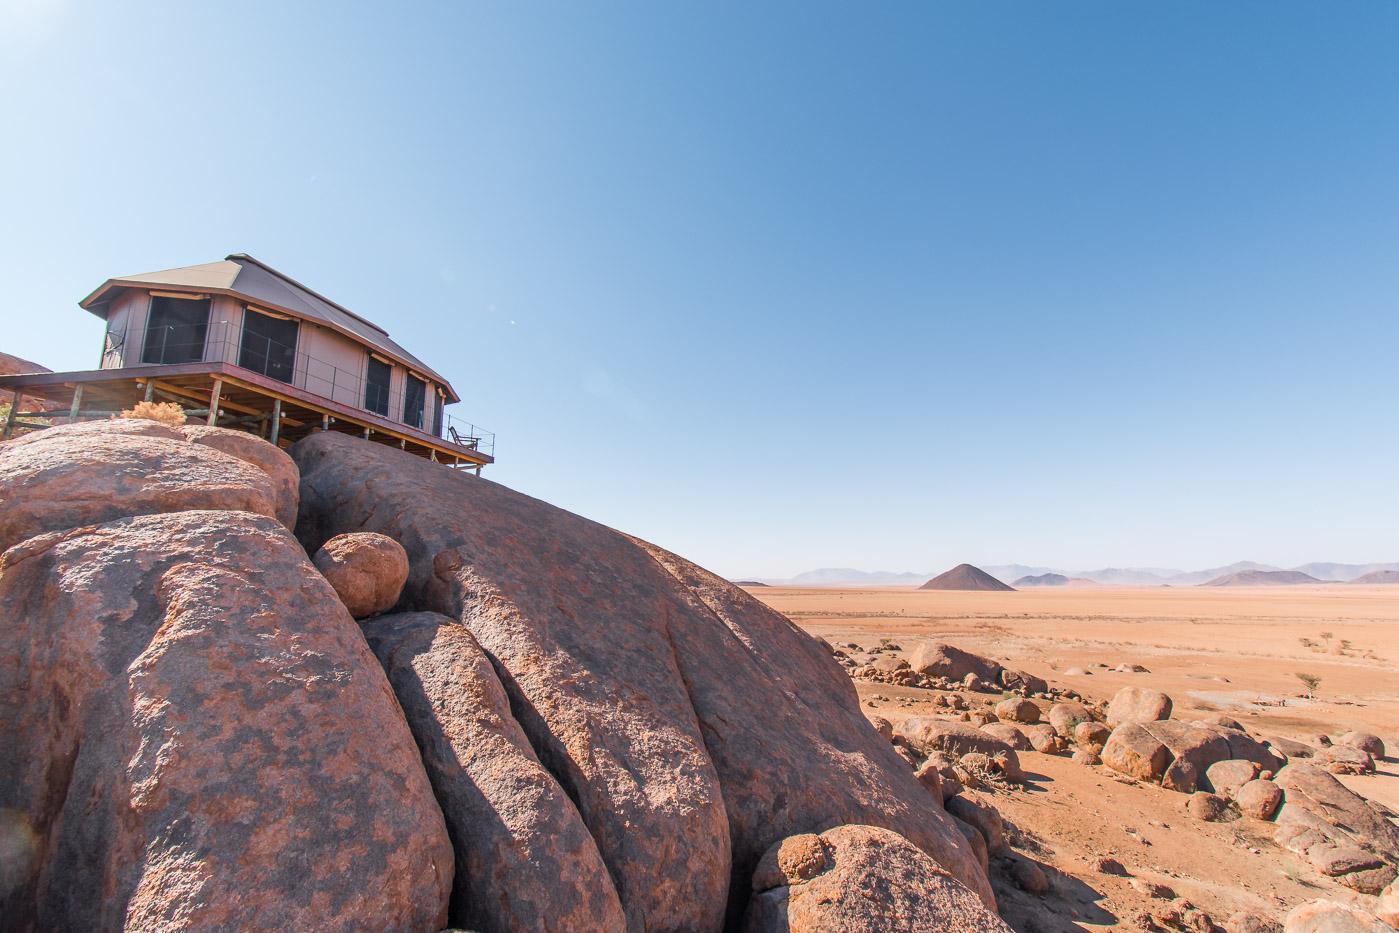 Namibie sonop hotel